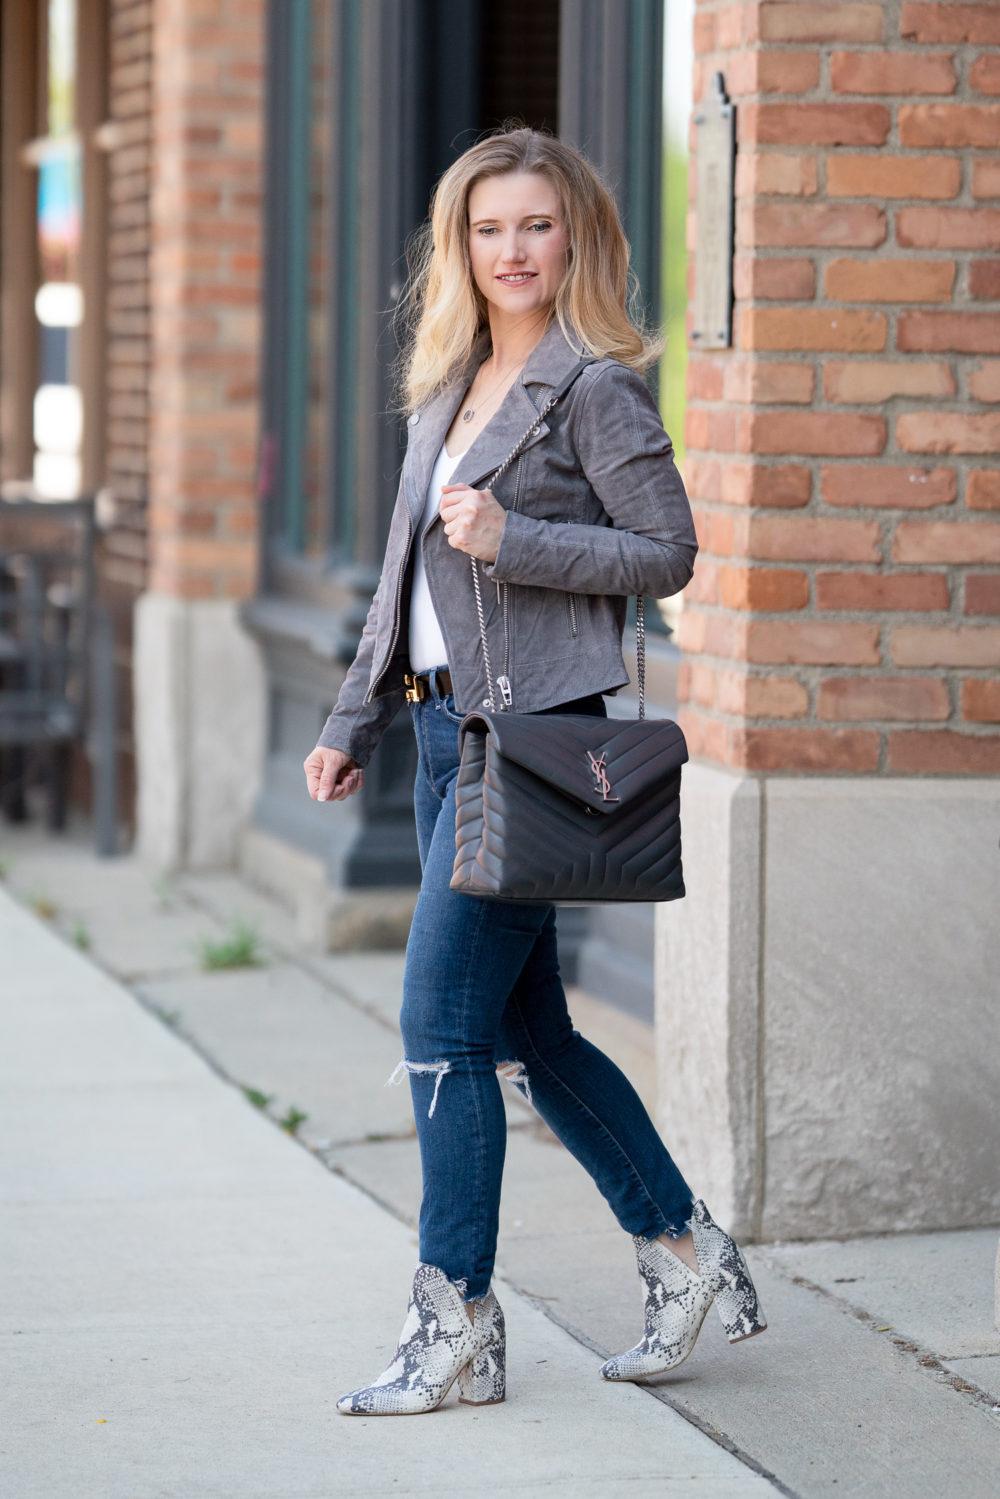 Petite Fashion Blog | Blank NYC Suede Moto Jacket | Steve Madden Rockstar Bootie | Hermes Belt | YSL Lou Lou Bag